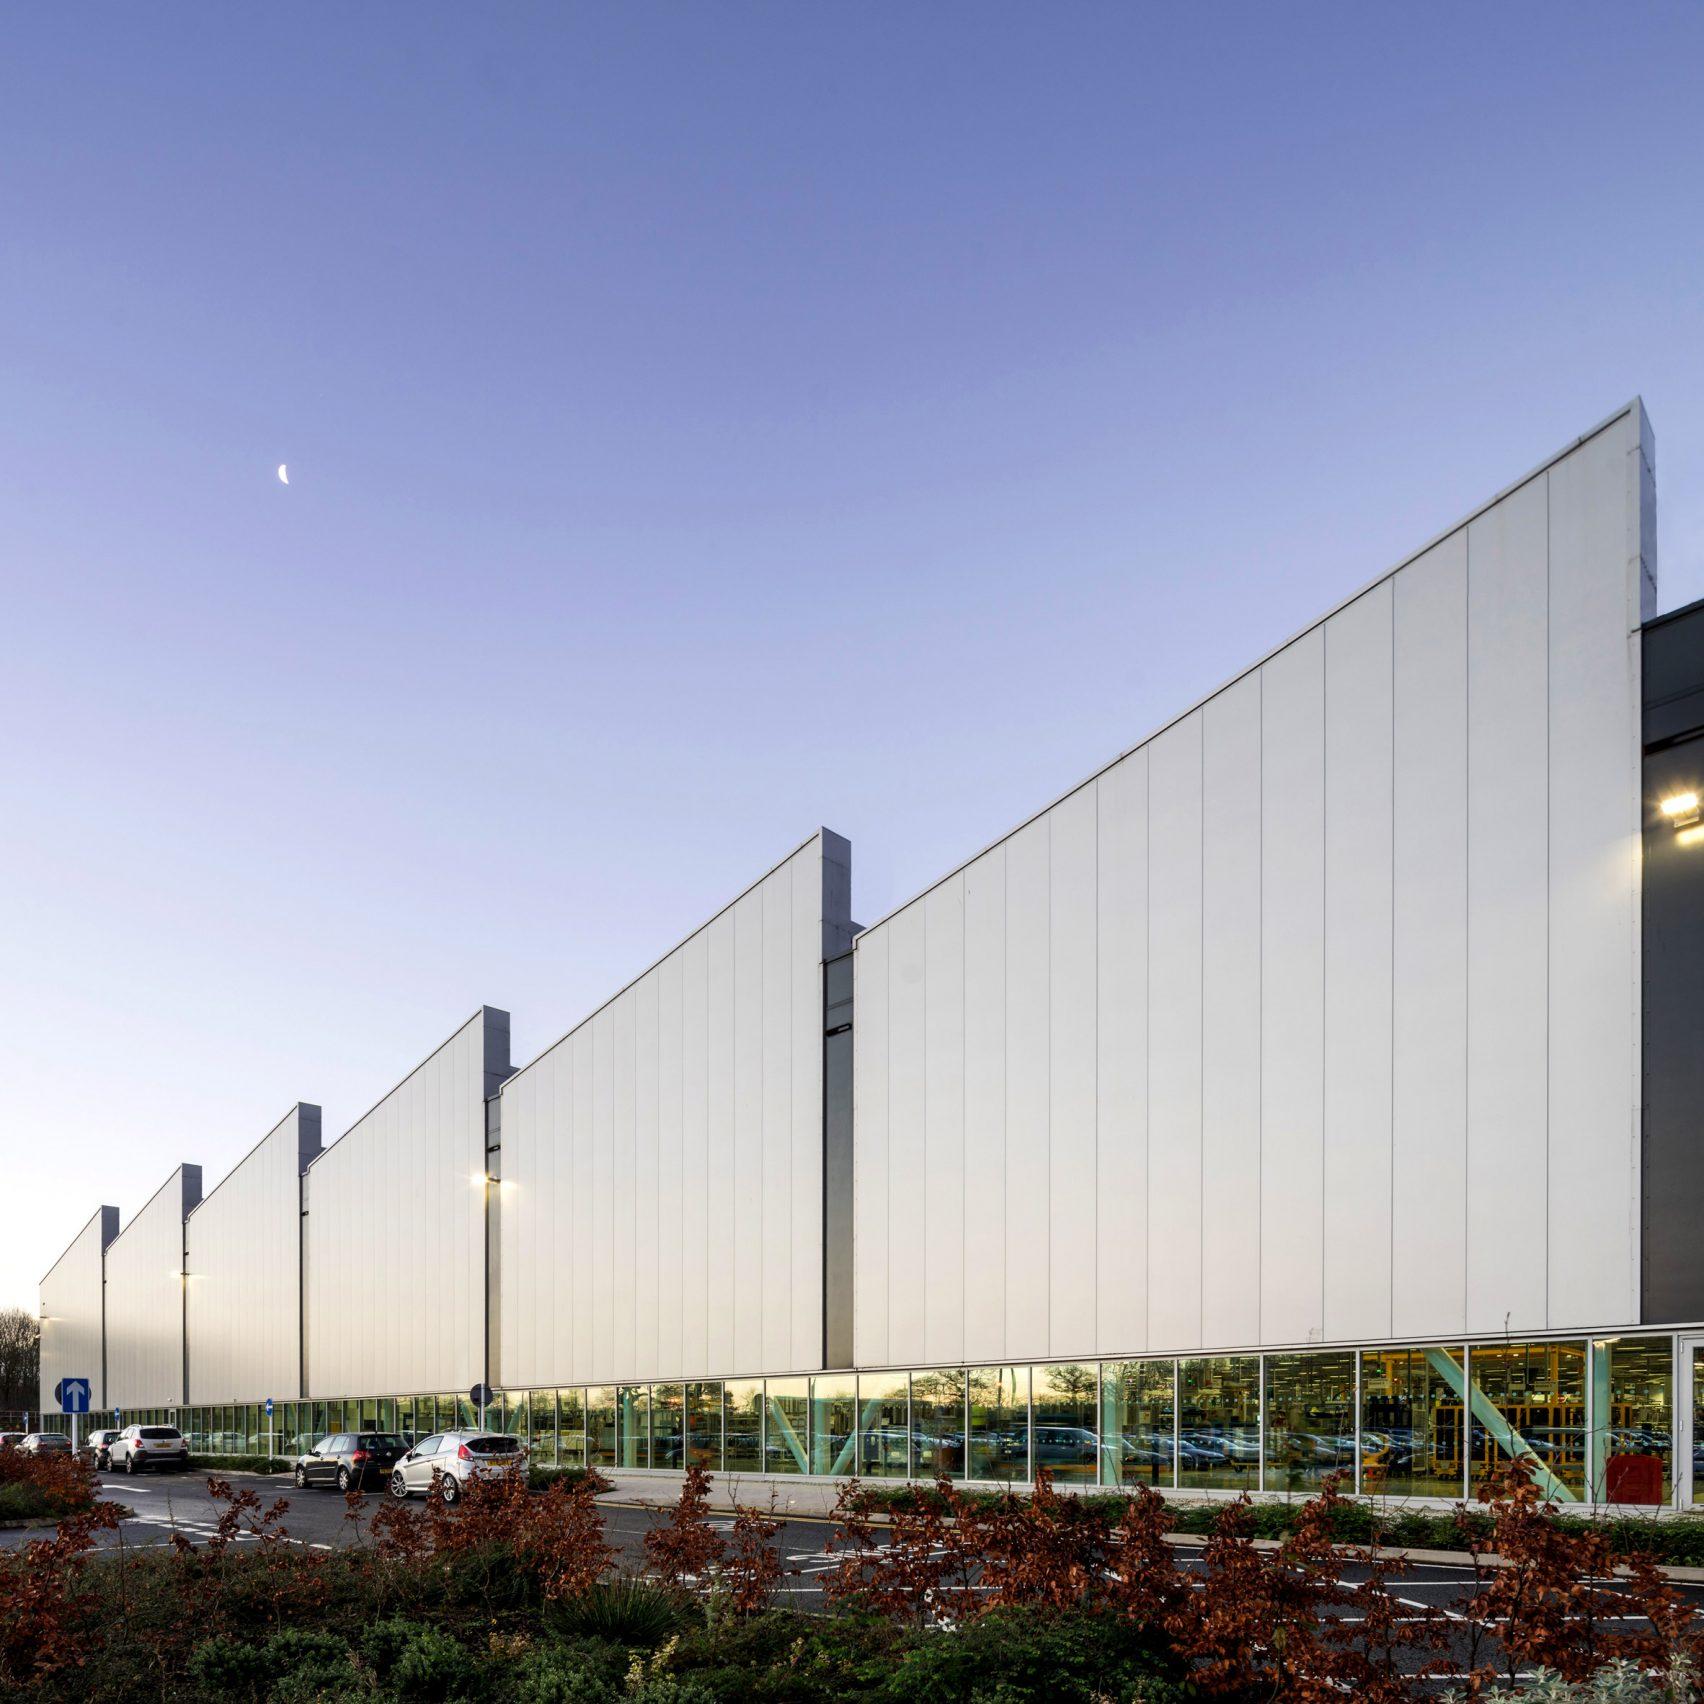 Jaguar Land Rover Engine Manufacturing Centre by Arup Associates